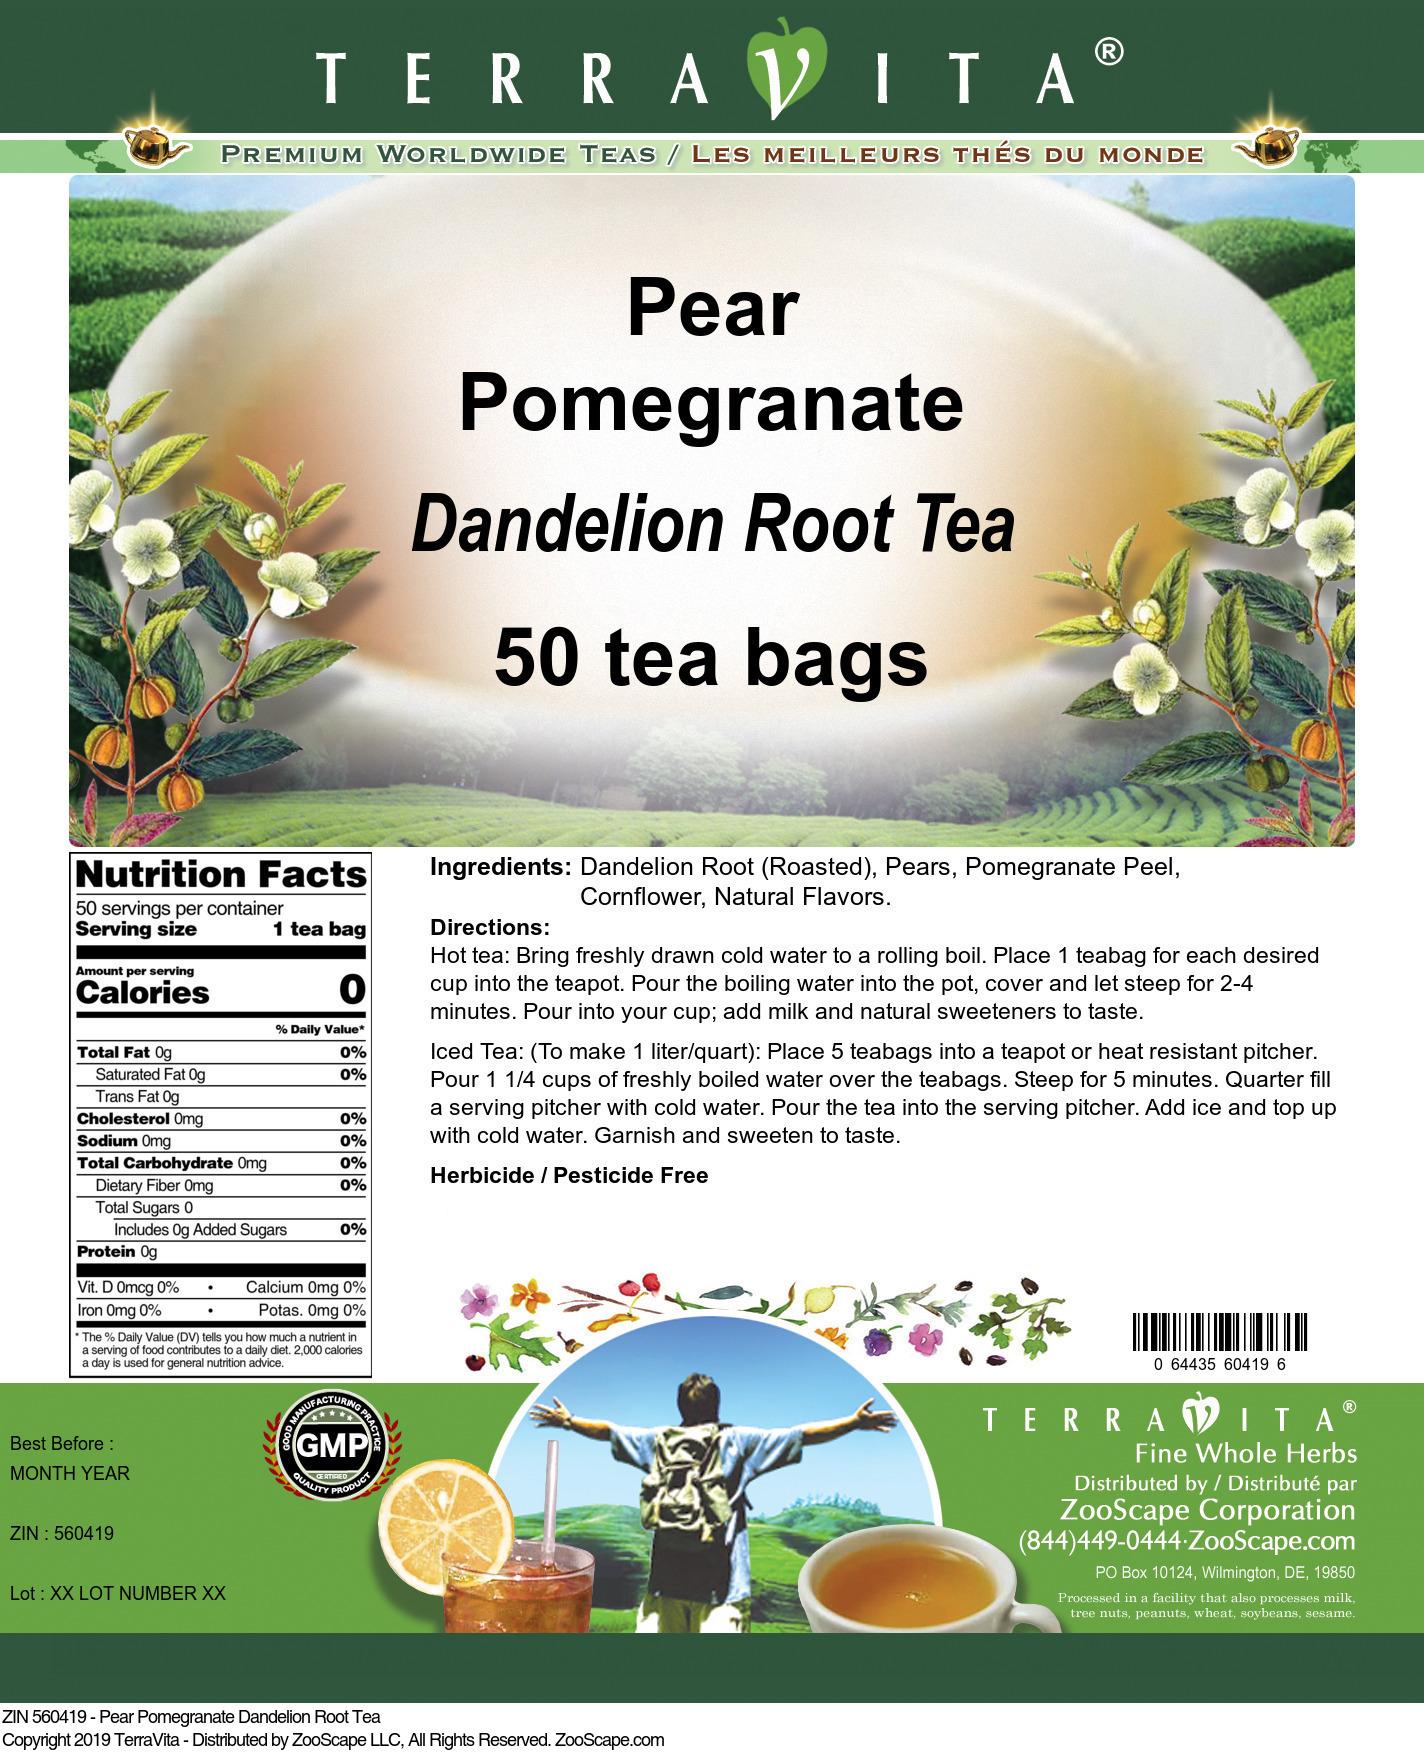 Pear Pomegranate Dandelion Root